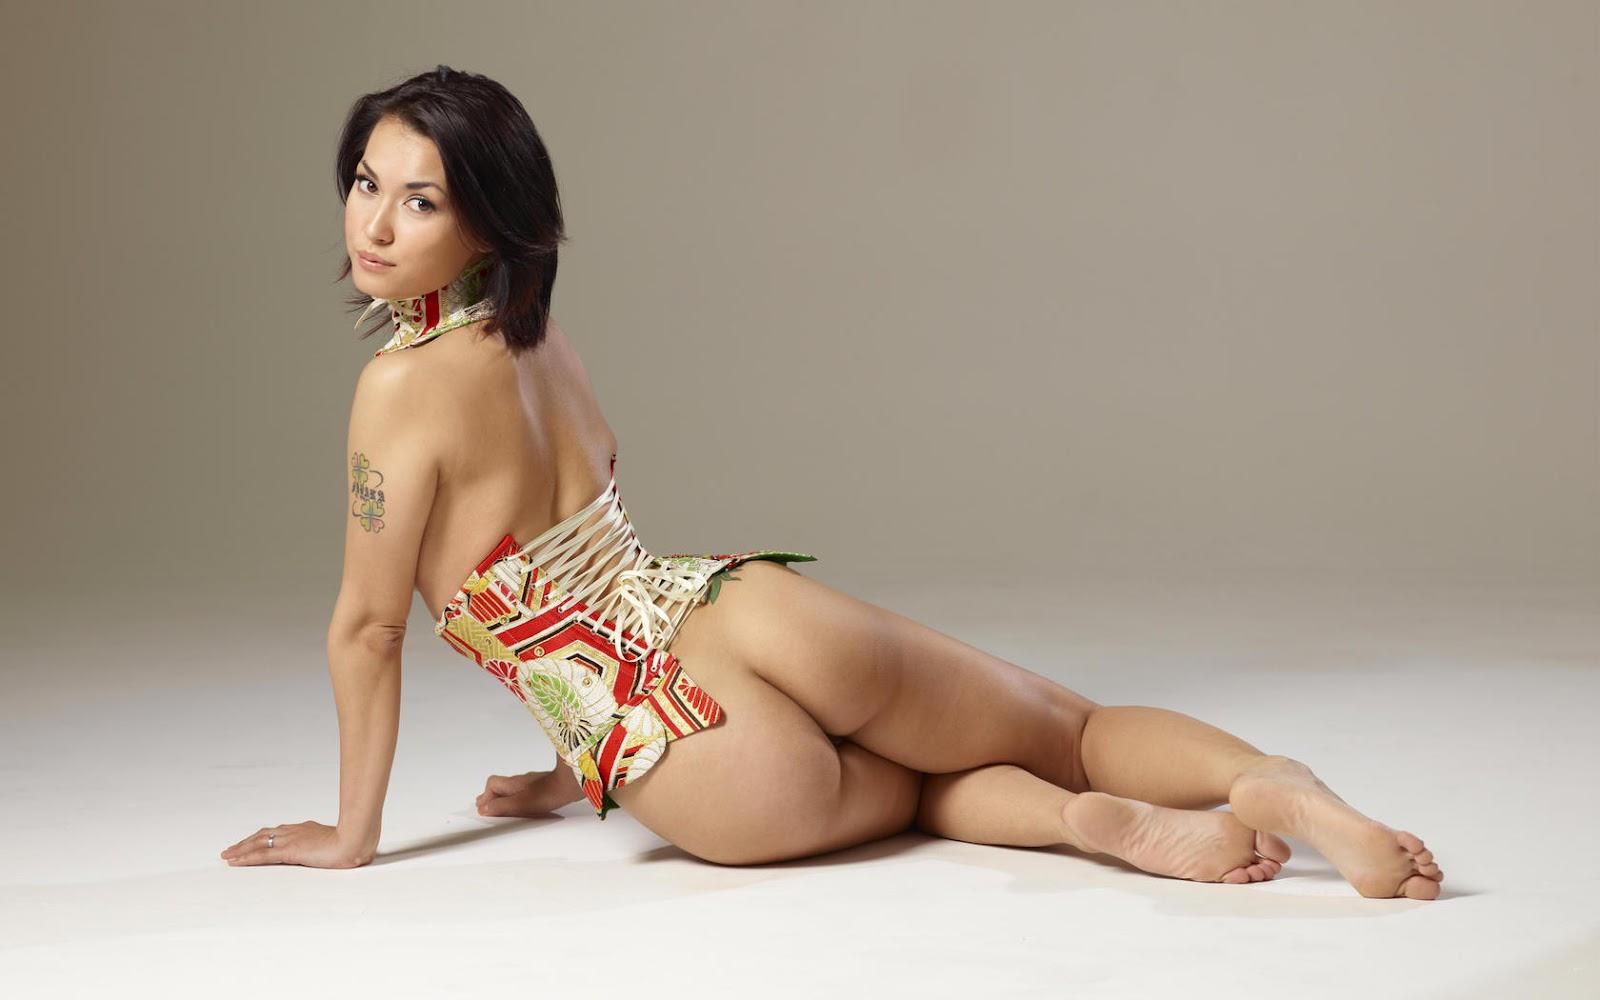 Naked HD: Maria Ozawa